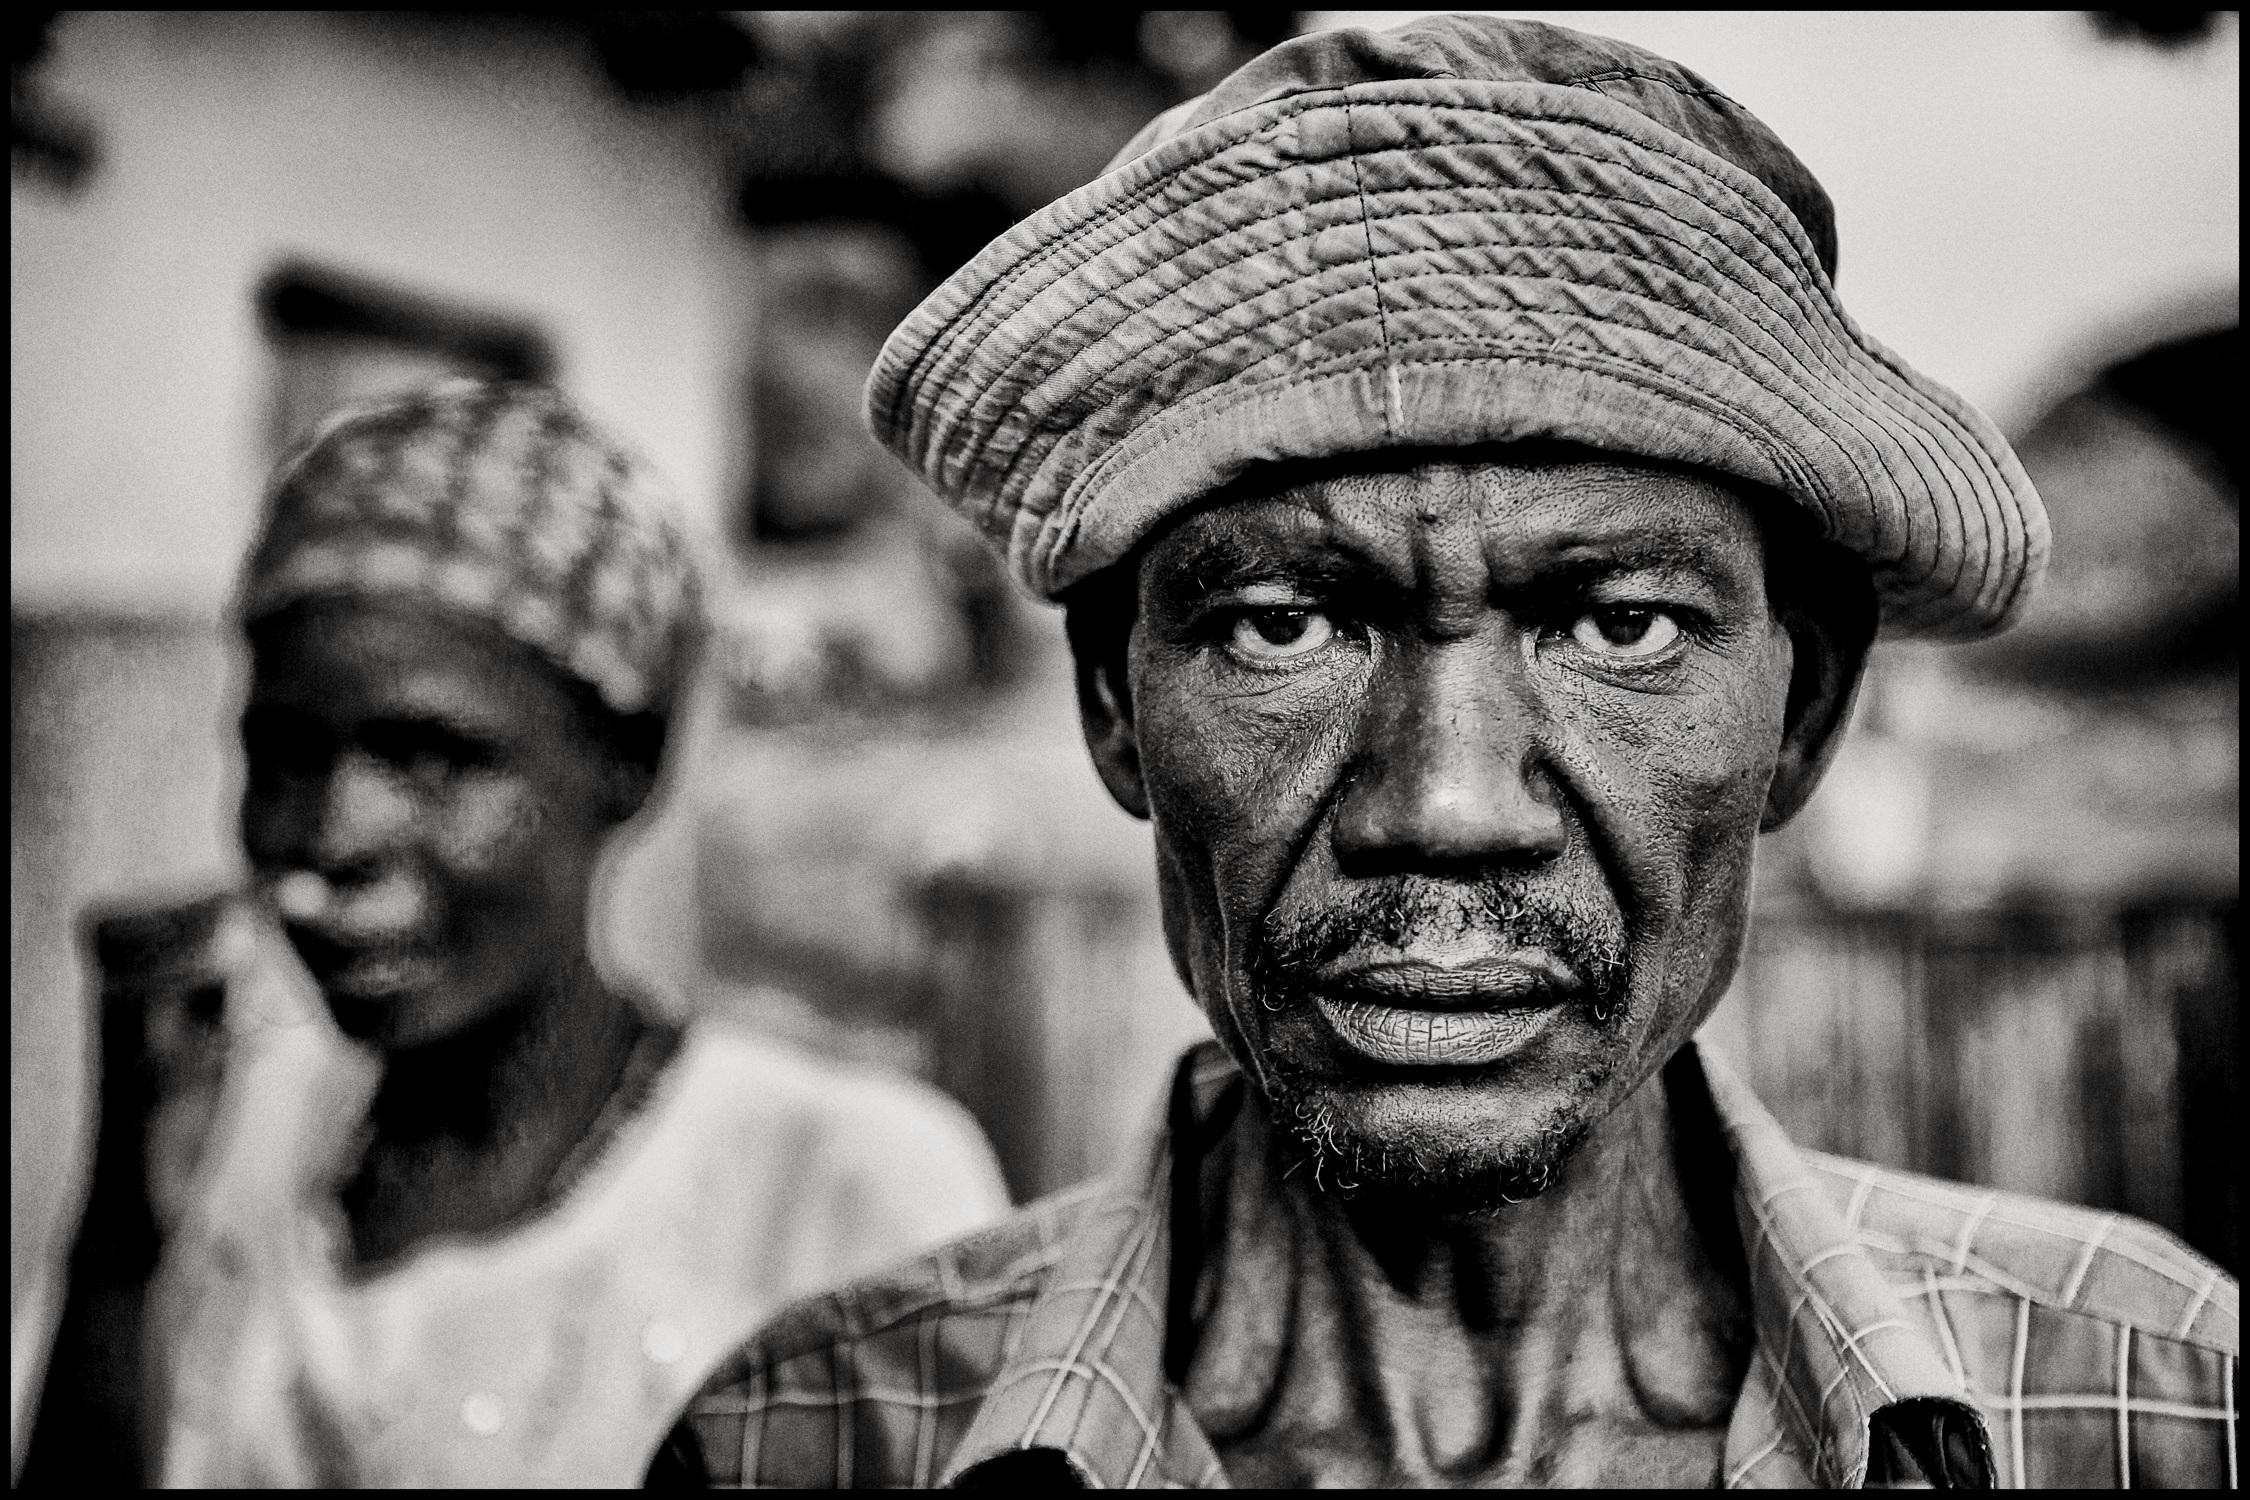 CENTR_AFRIKA-165-bewerkt-2.jpg